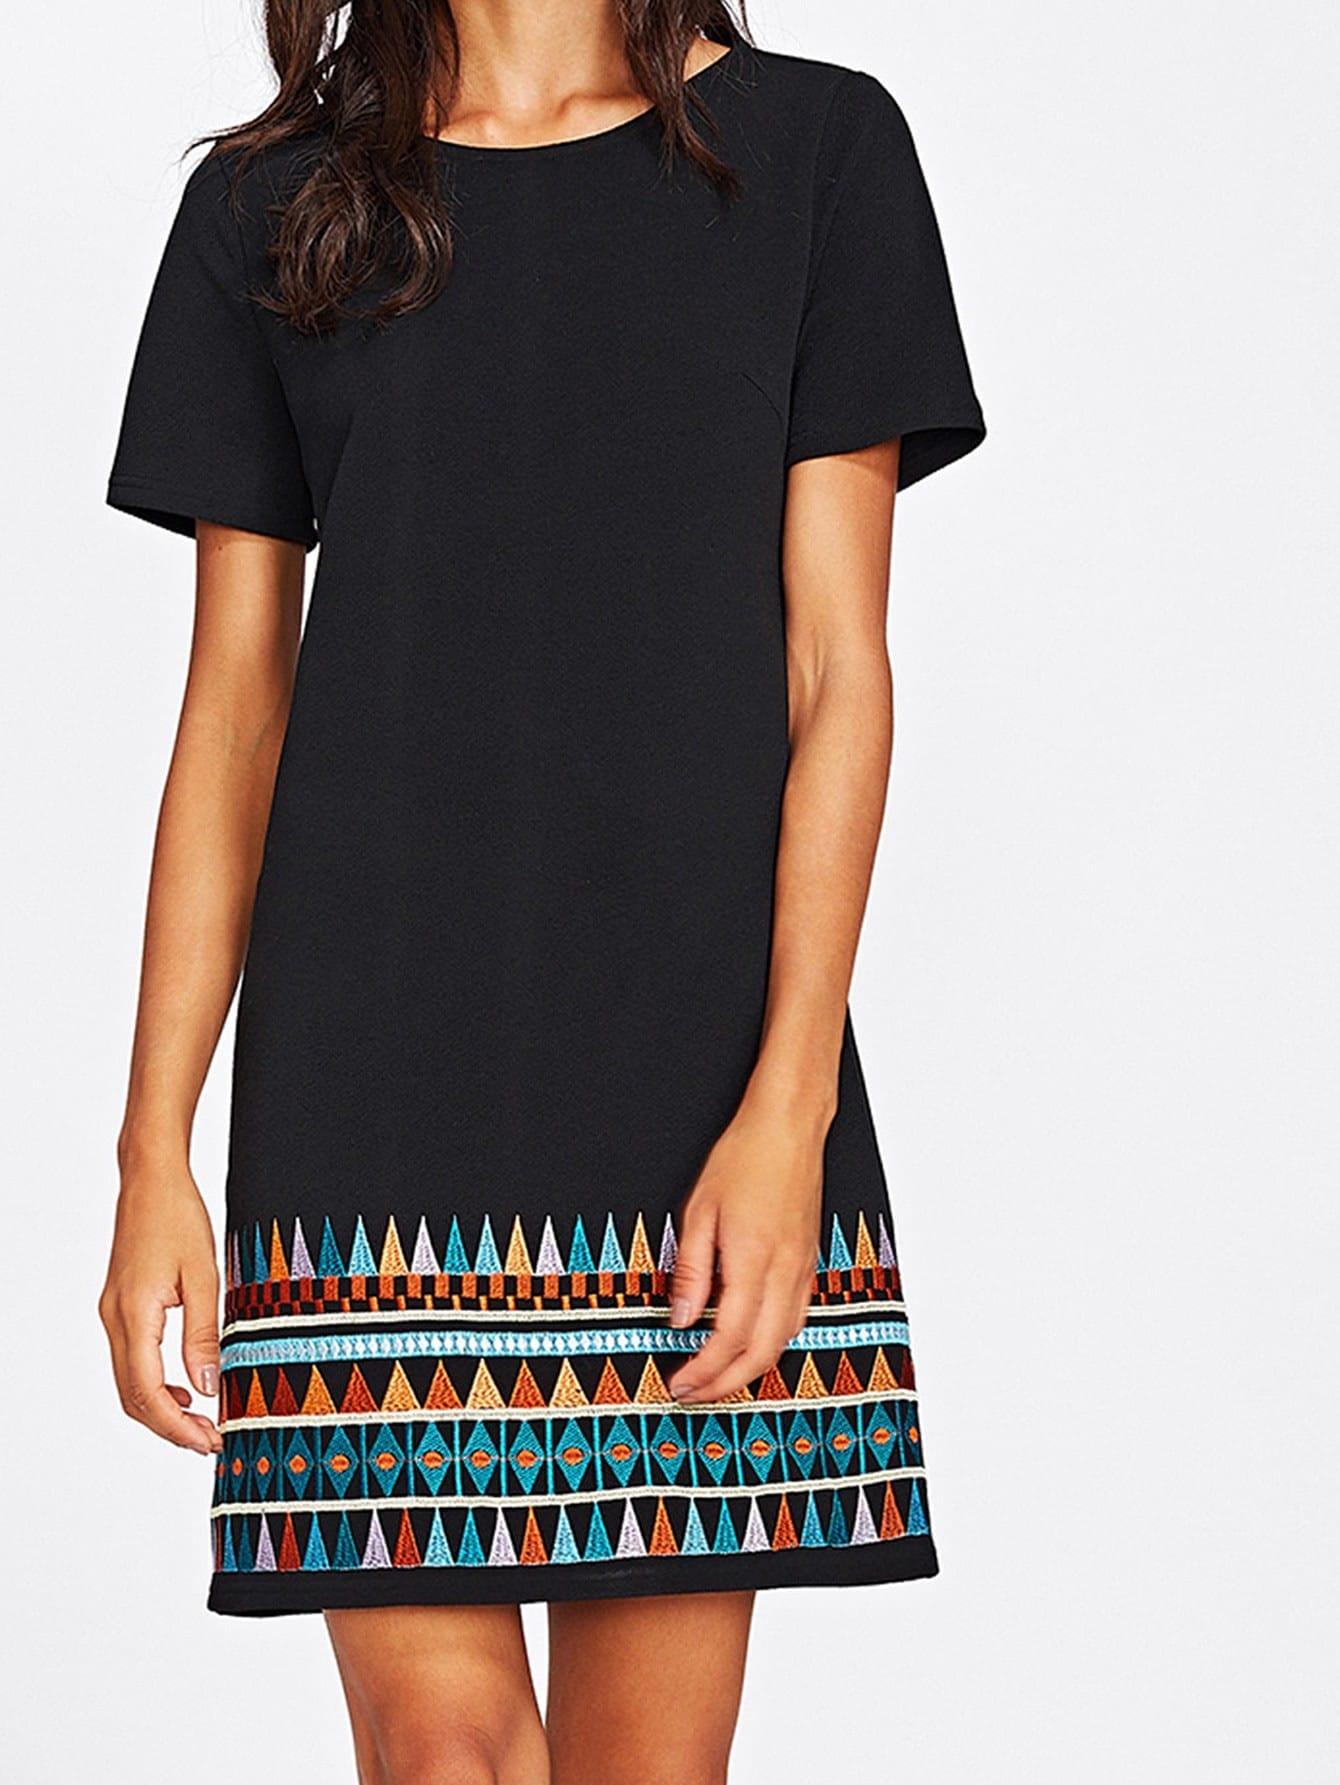 Aztec Embroidered Hem Dress